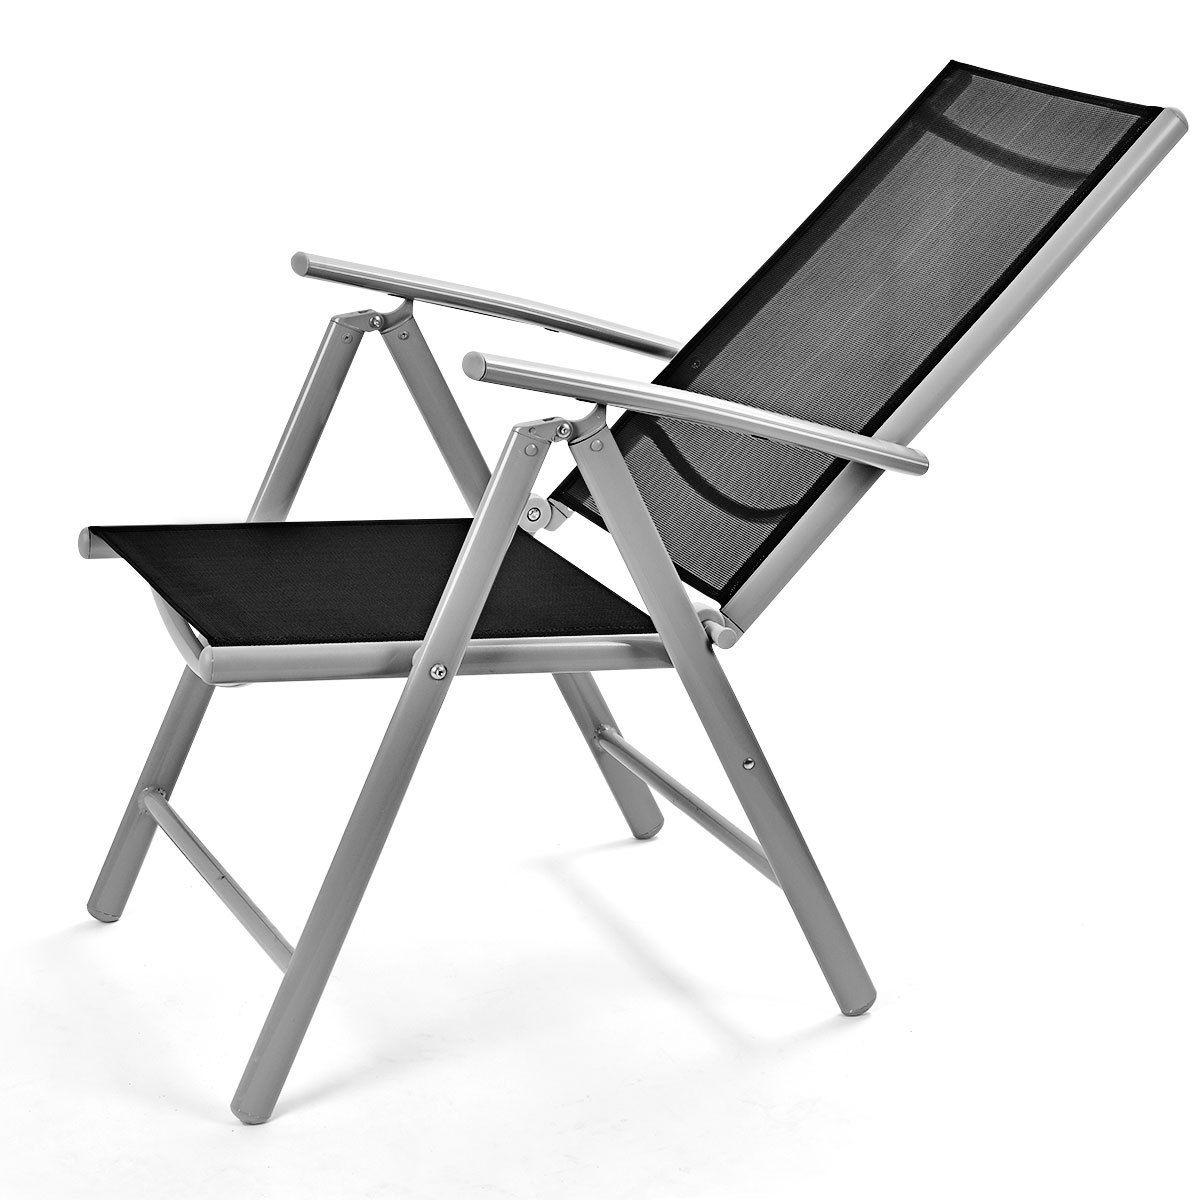 Set of 2 Patio Folding Chairs